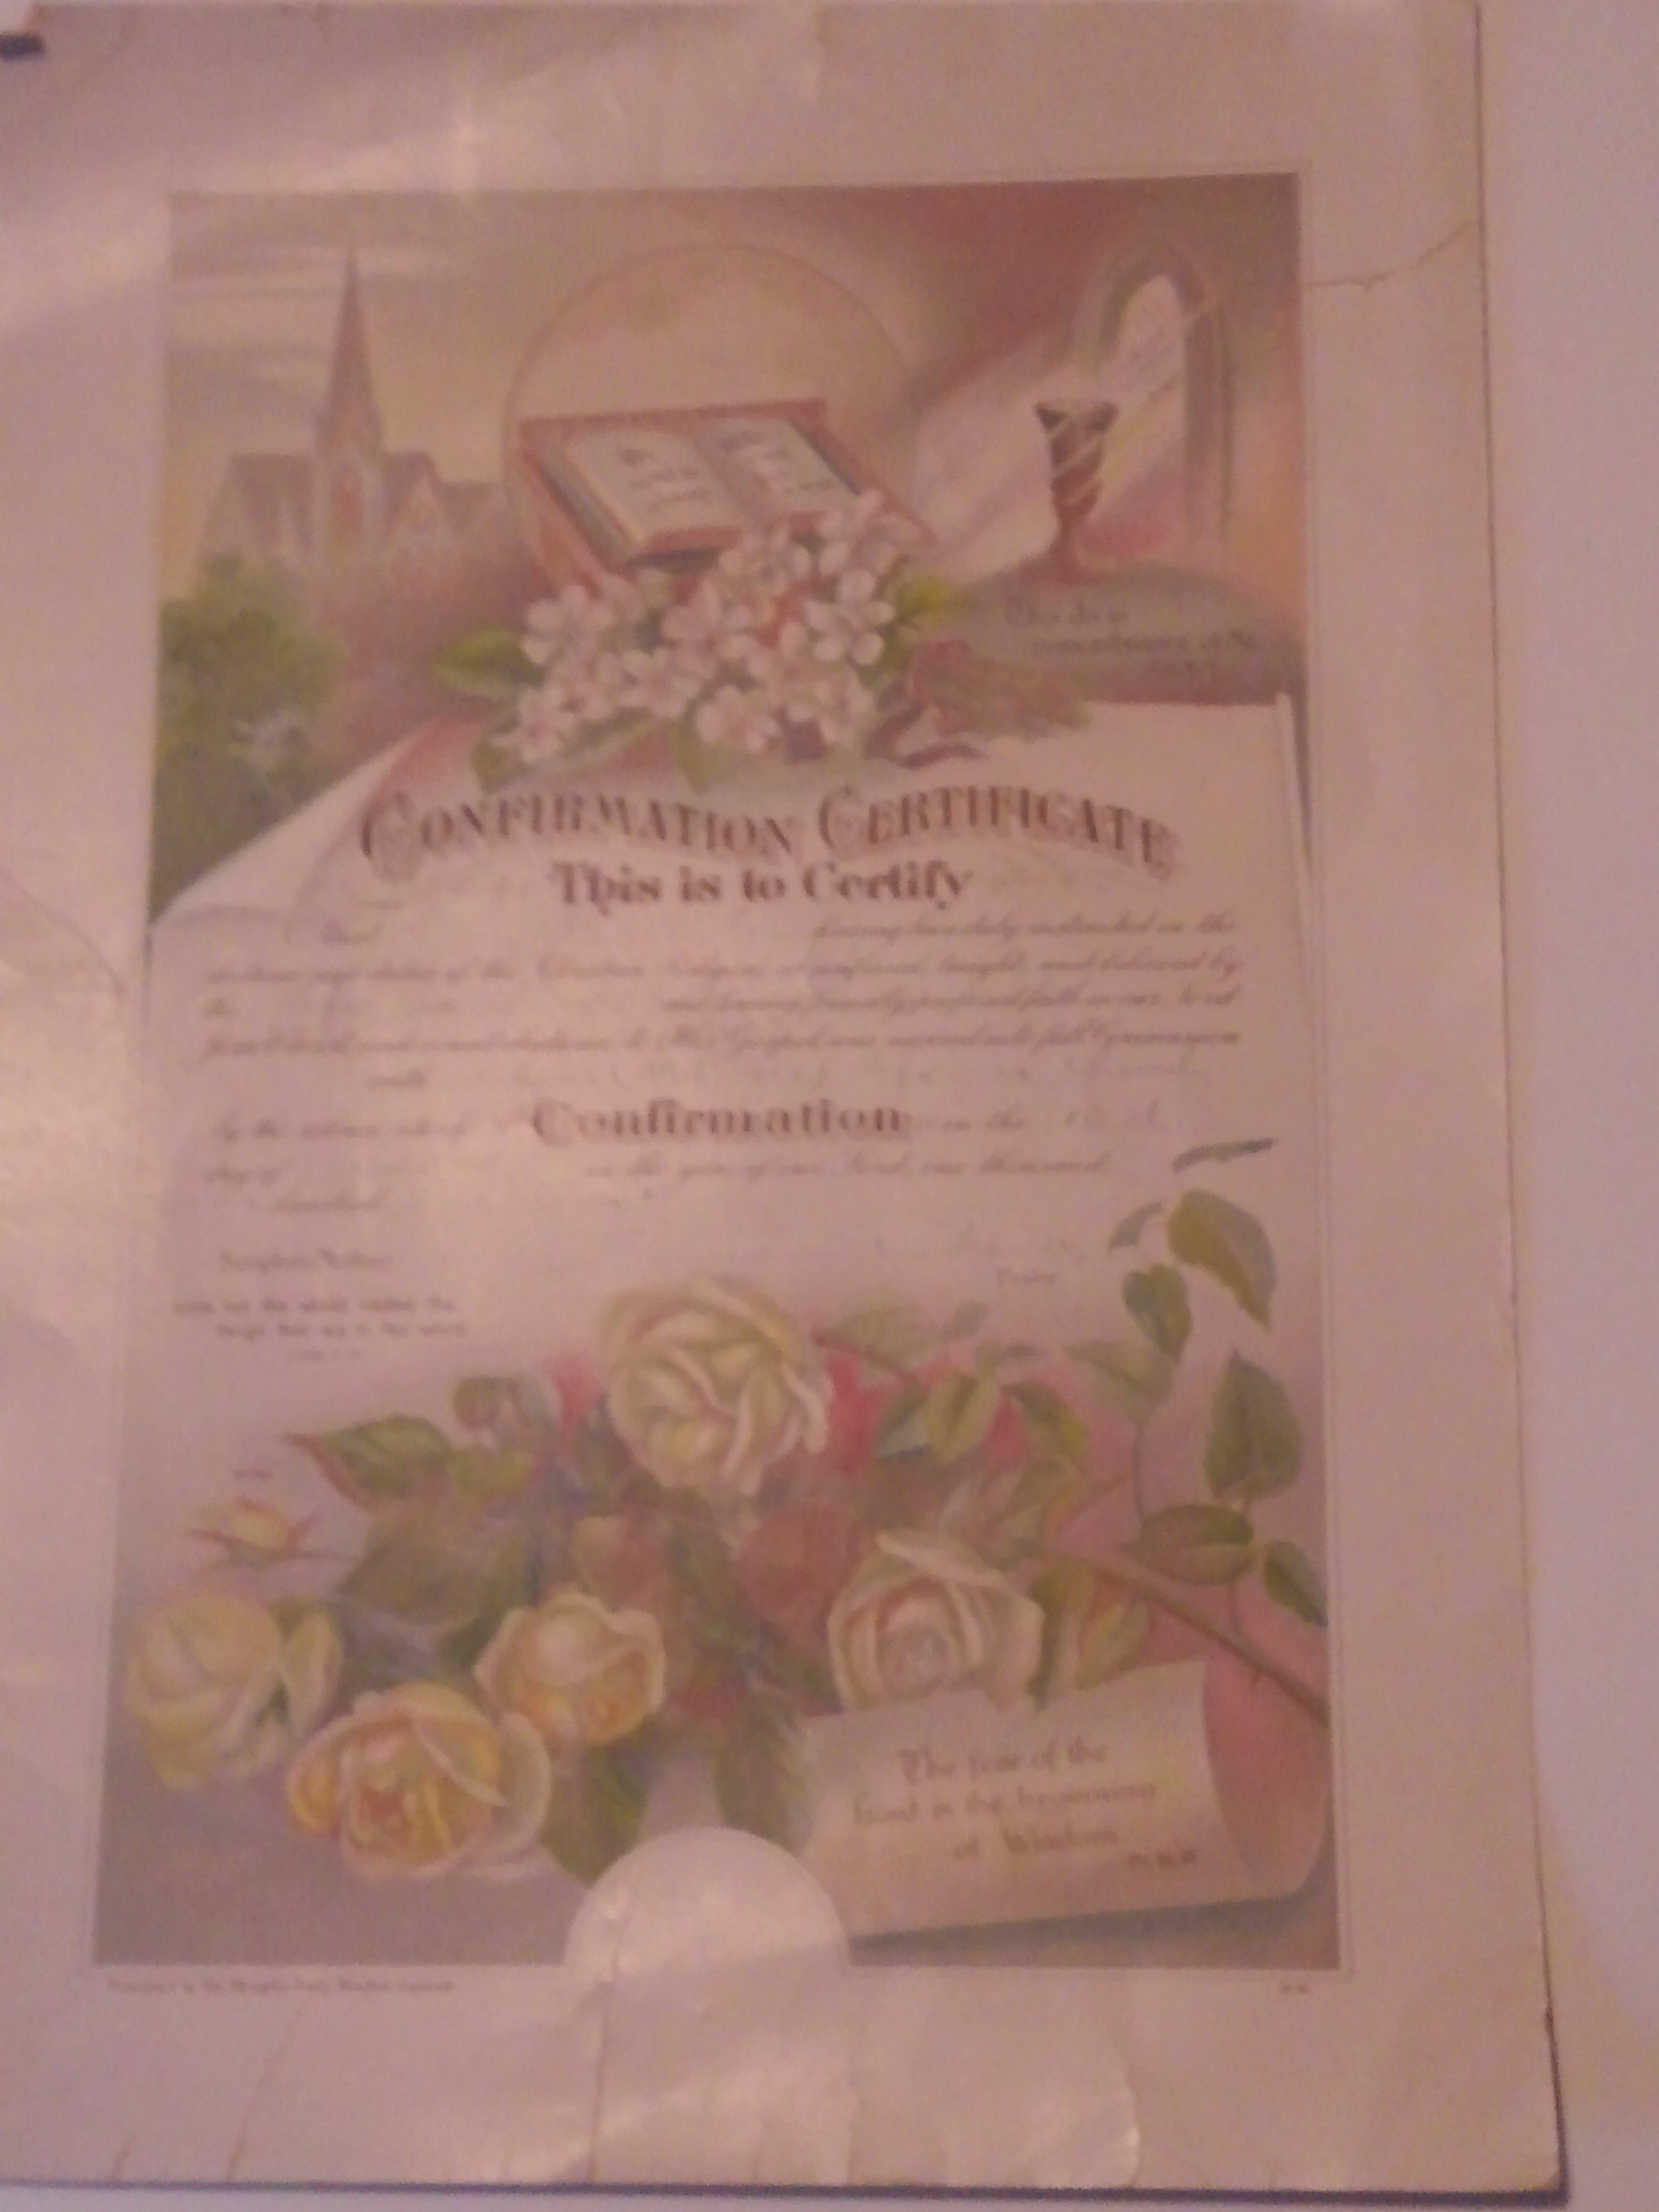 Confirmation Certificaqte Amy Ellen Bohn 10-13-1917